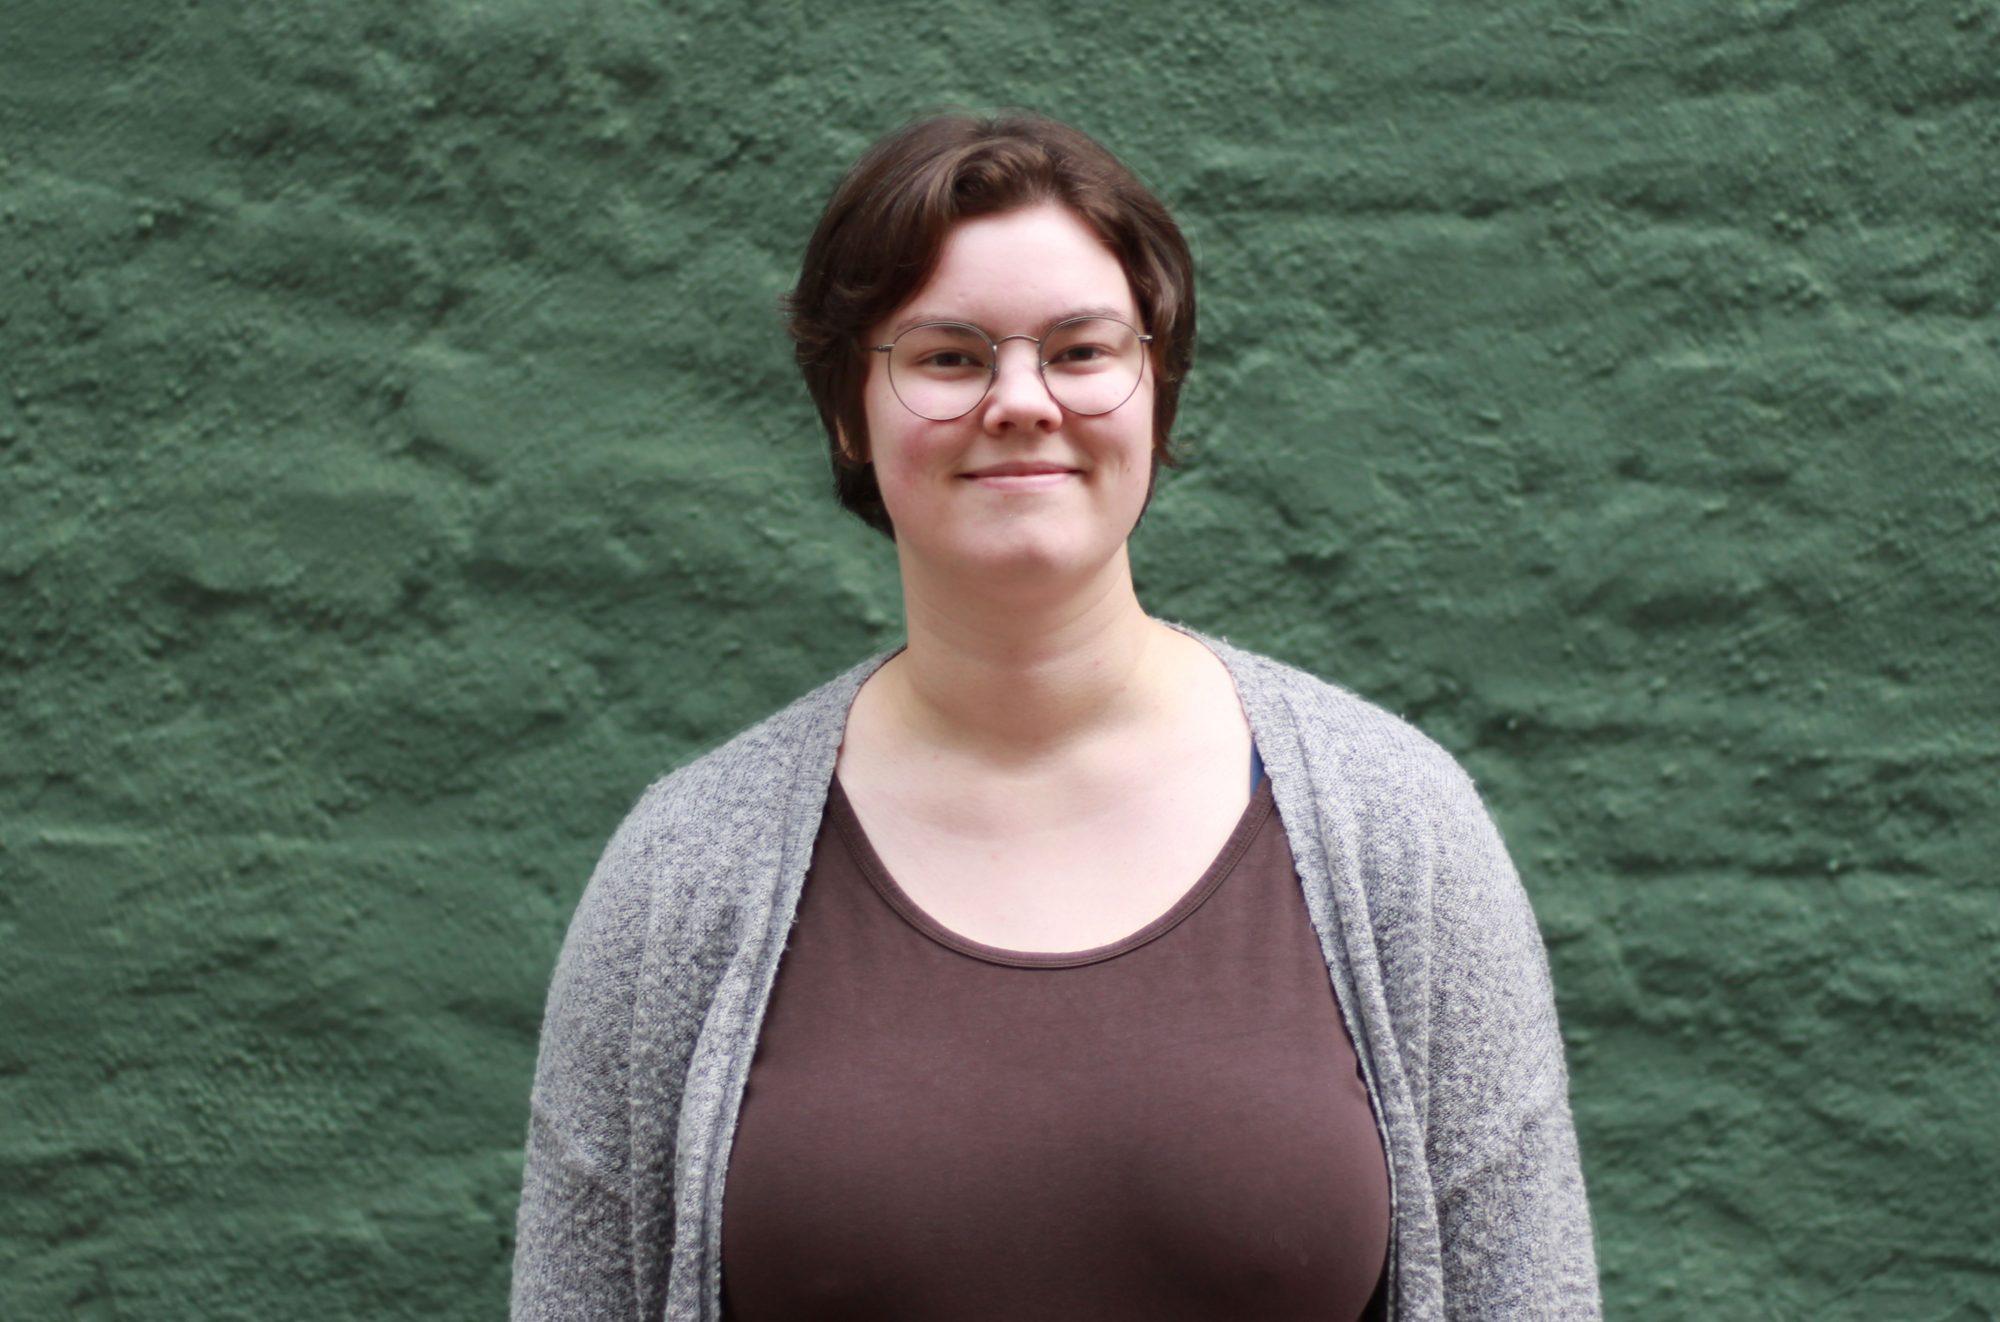 Gunnhild Skjold (23) frå Tromsø er leiar i Norsk Målungdom. Foto: Anna Sofie Ekeland Valvatne/NMU